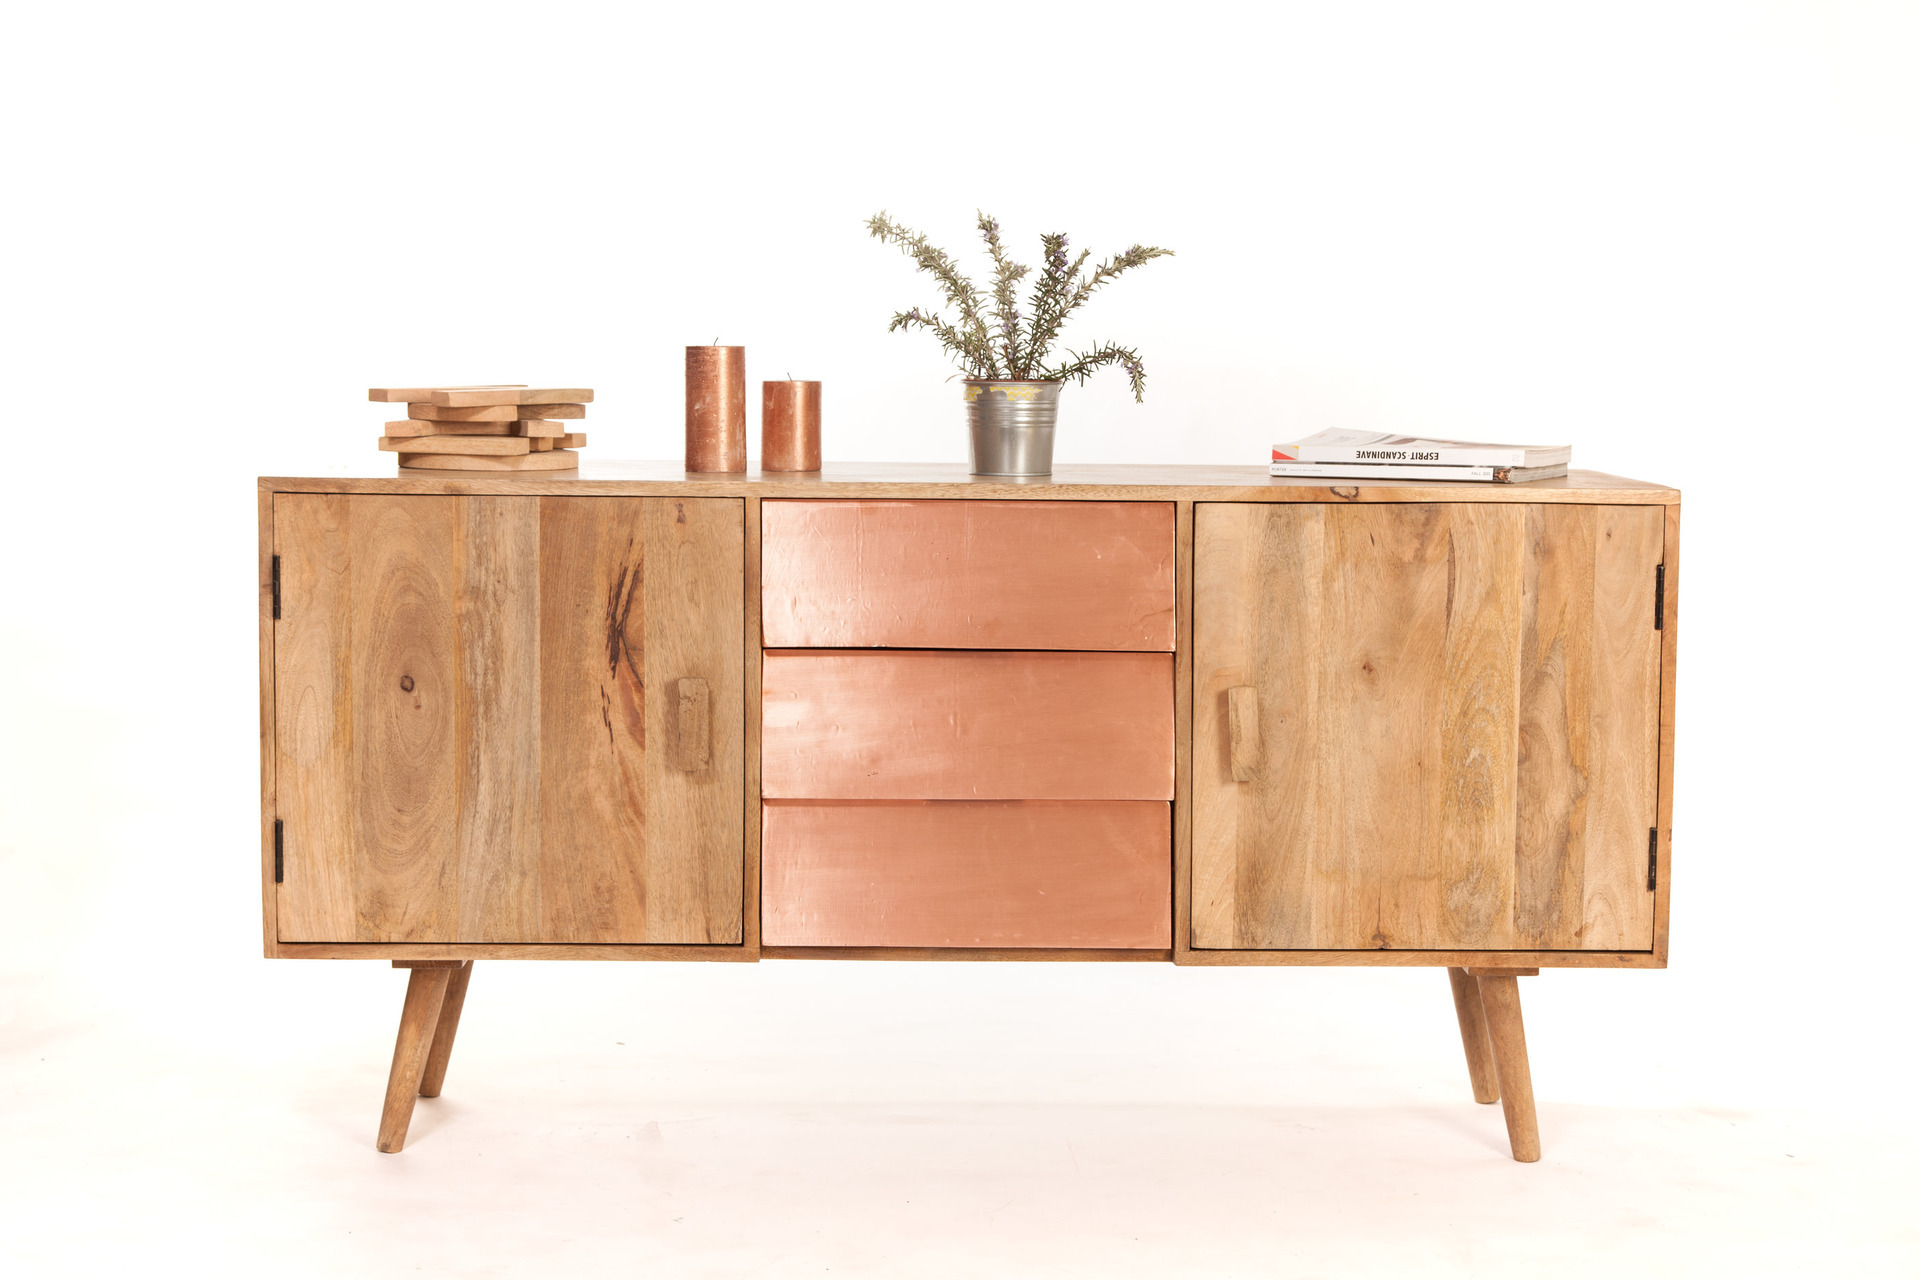 Meuble bois scandinave infini photo - Buffet pas cher meuble ...